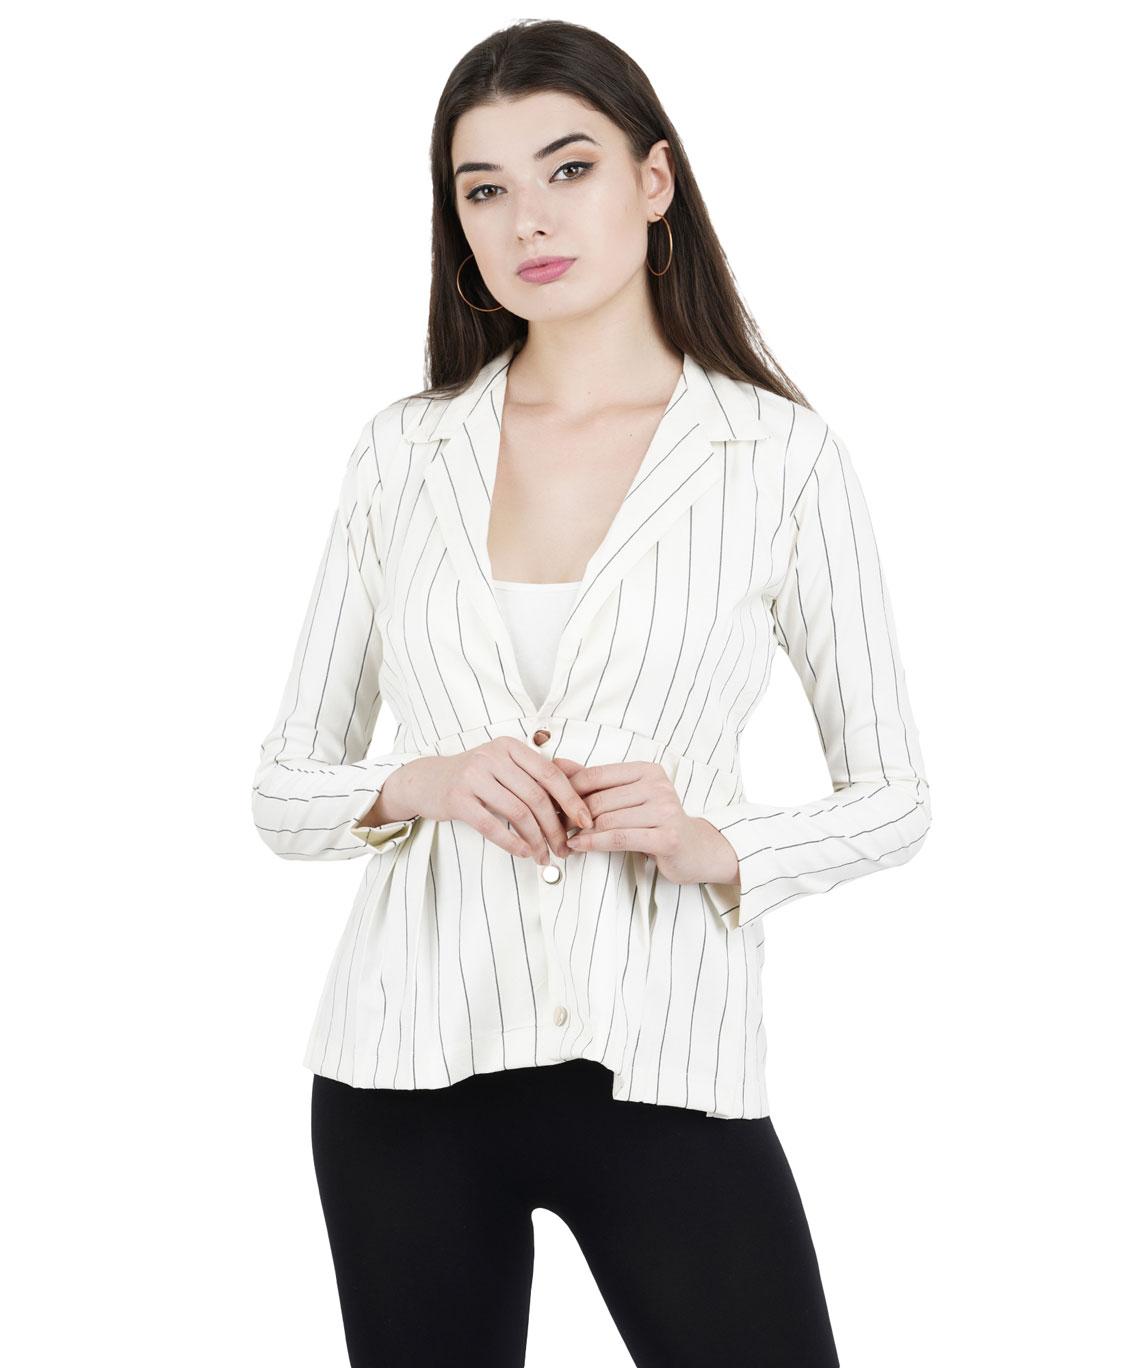 Clothsey Women`s Blazer/Jacket